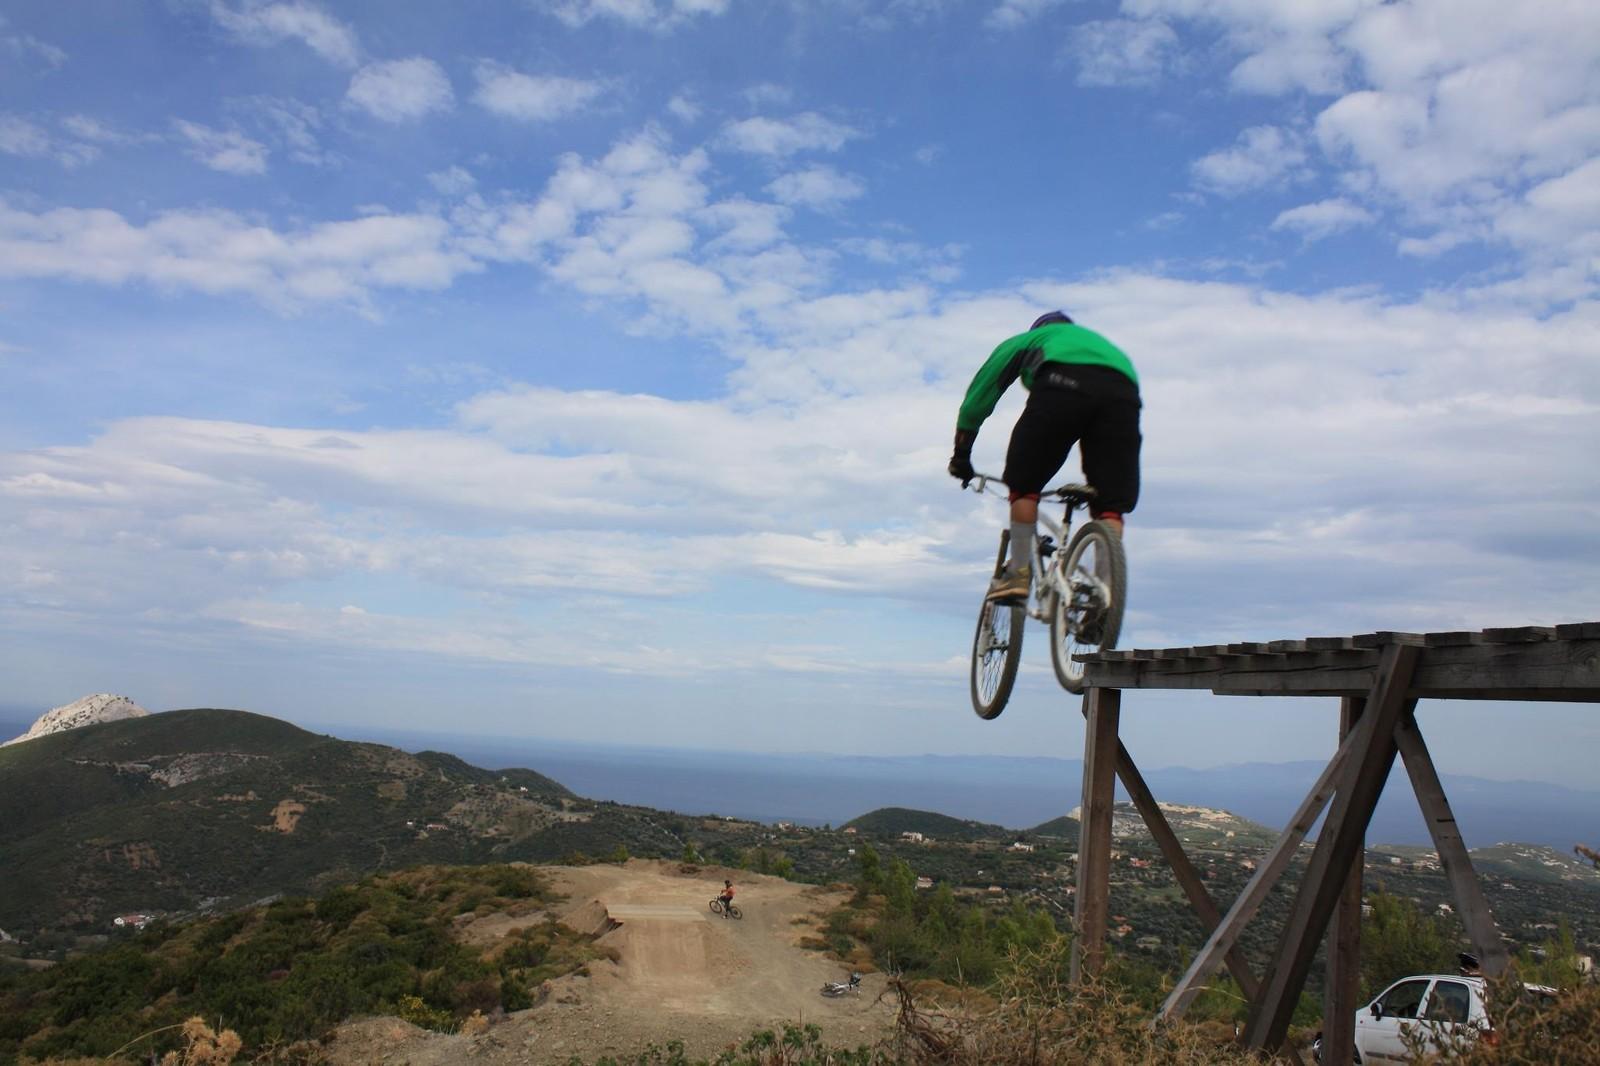 kimi trail,Evia,Greece - Yohan.panou - Mountain Biking Pictures - Vital MTB